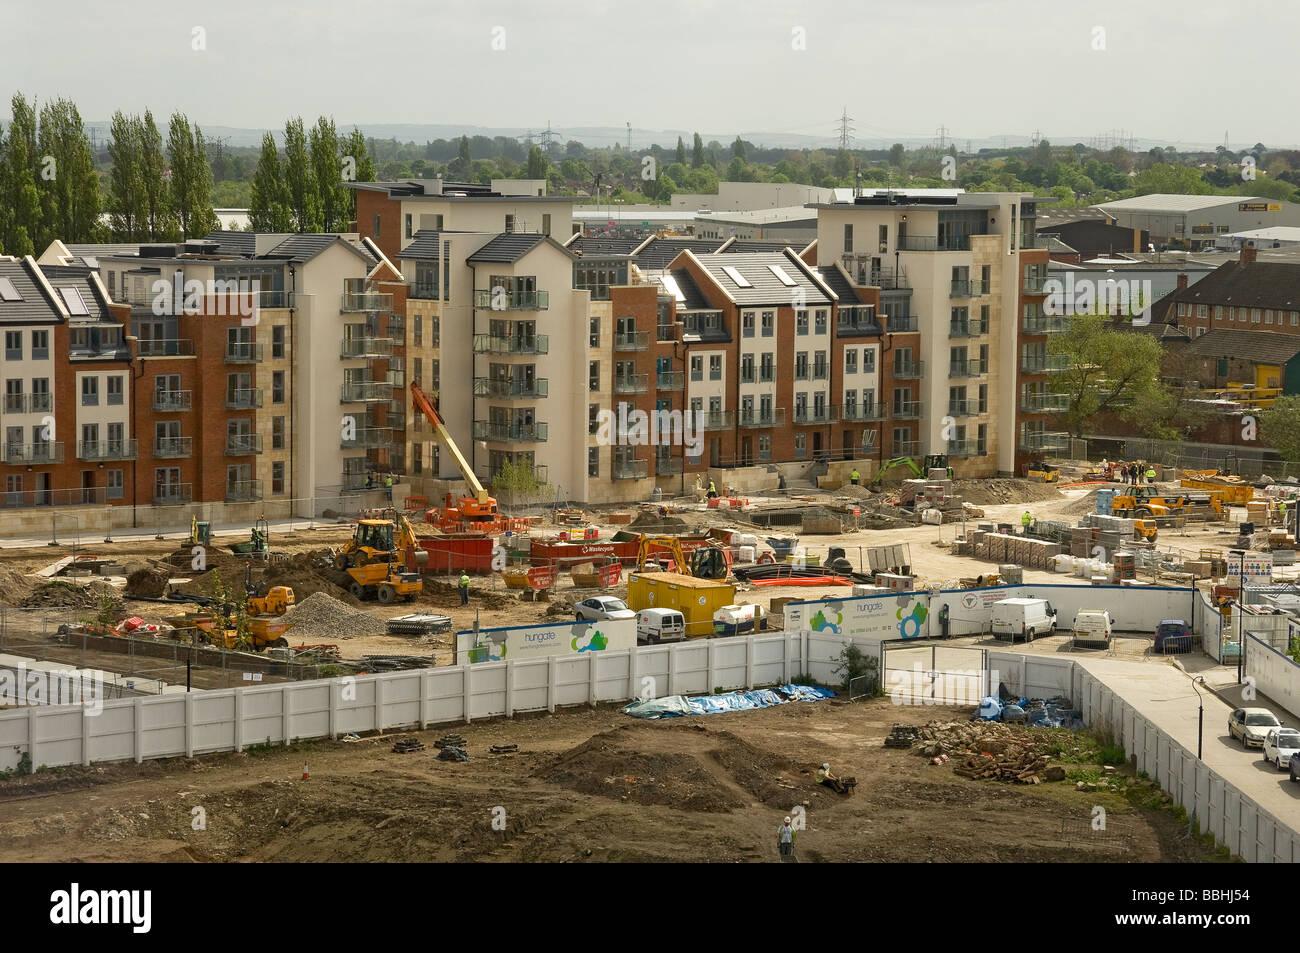 New Housing Development : New housing development hungate york north yorkshire